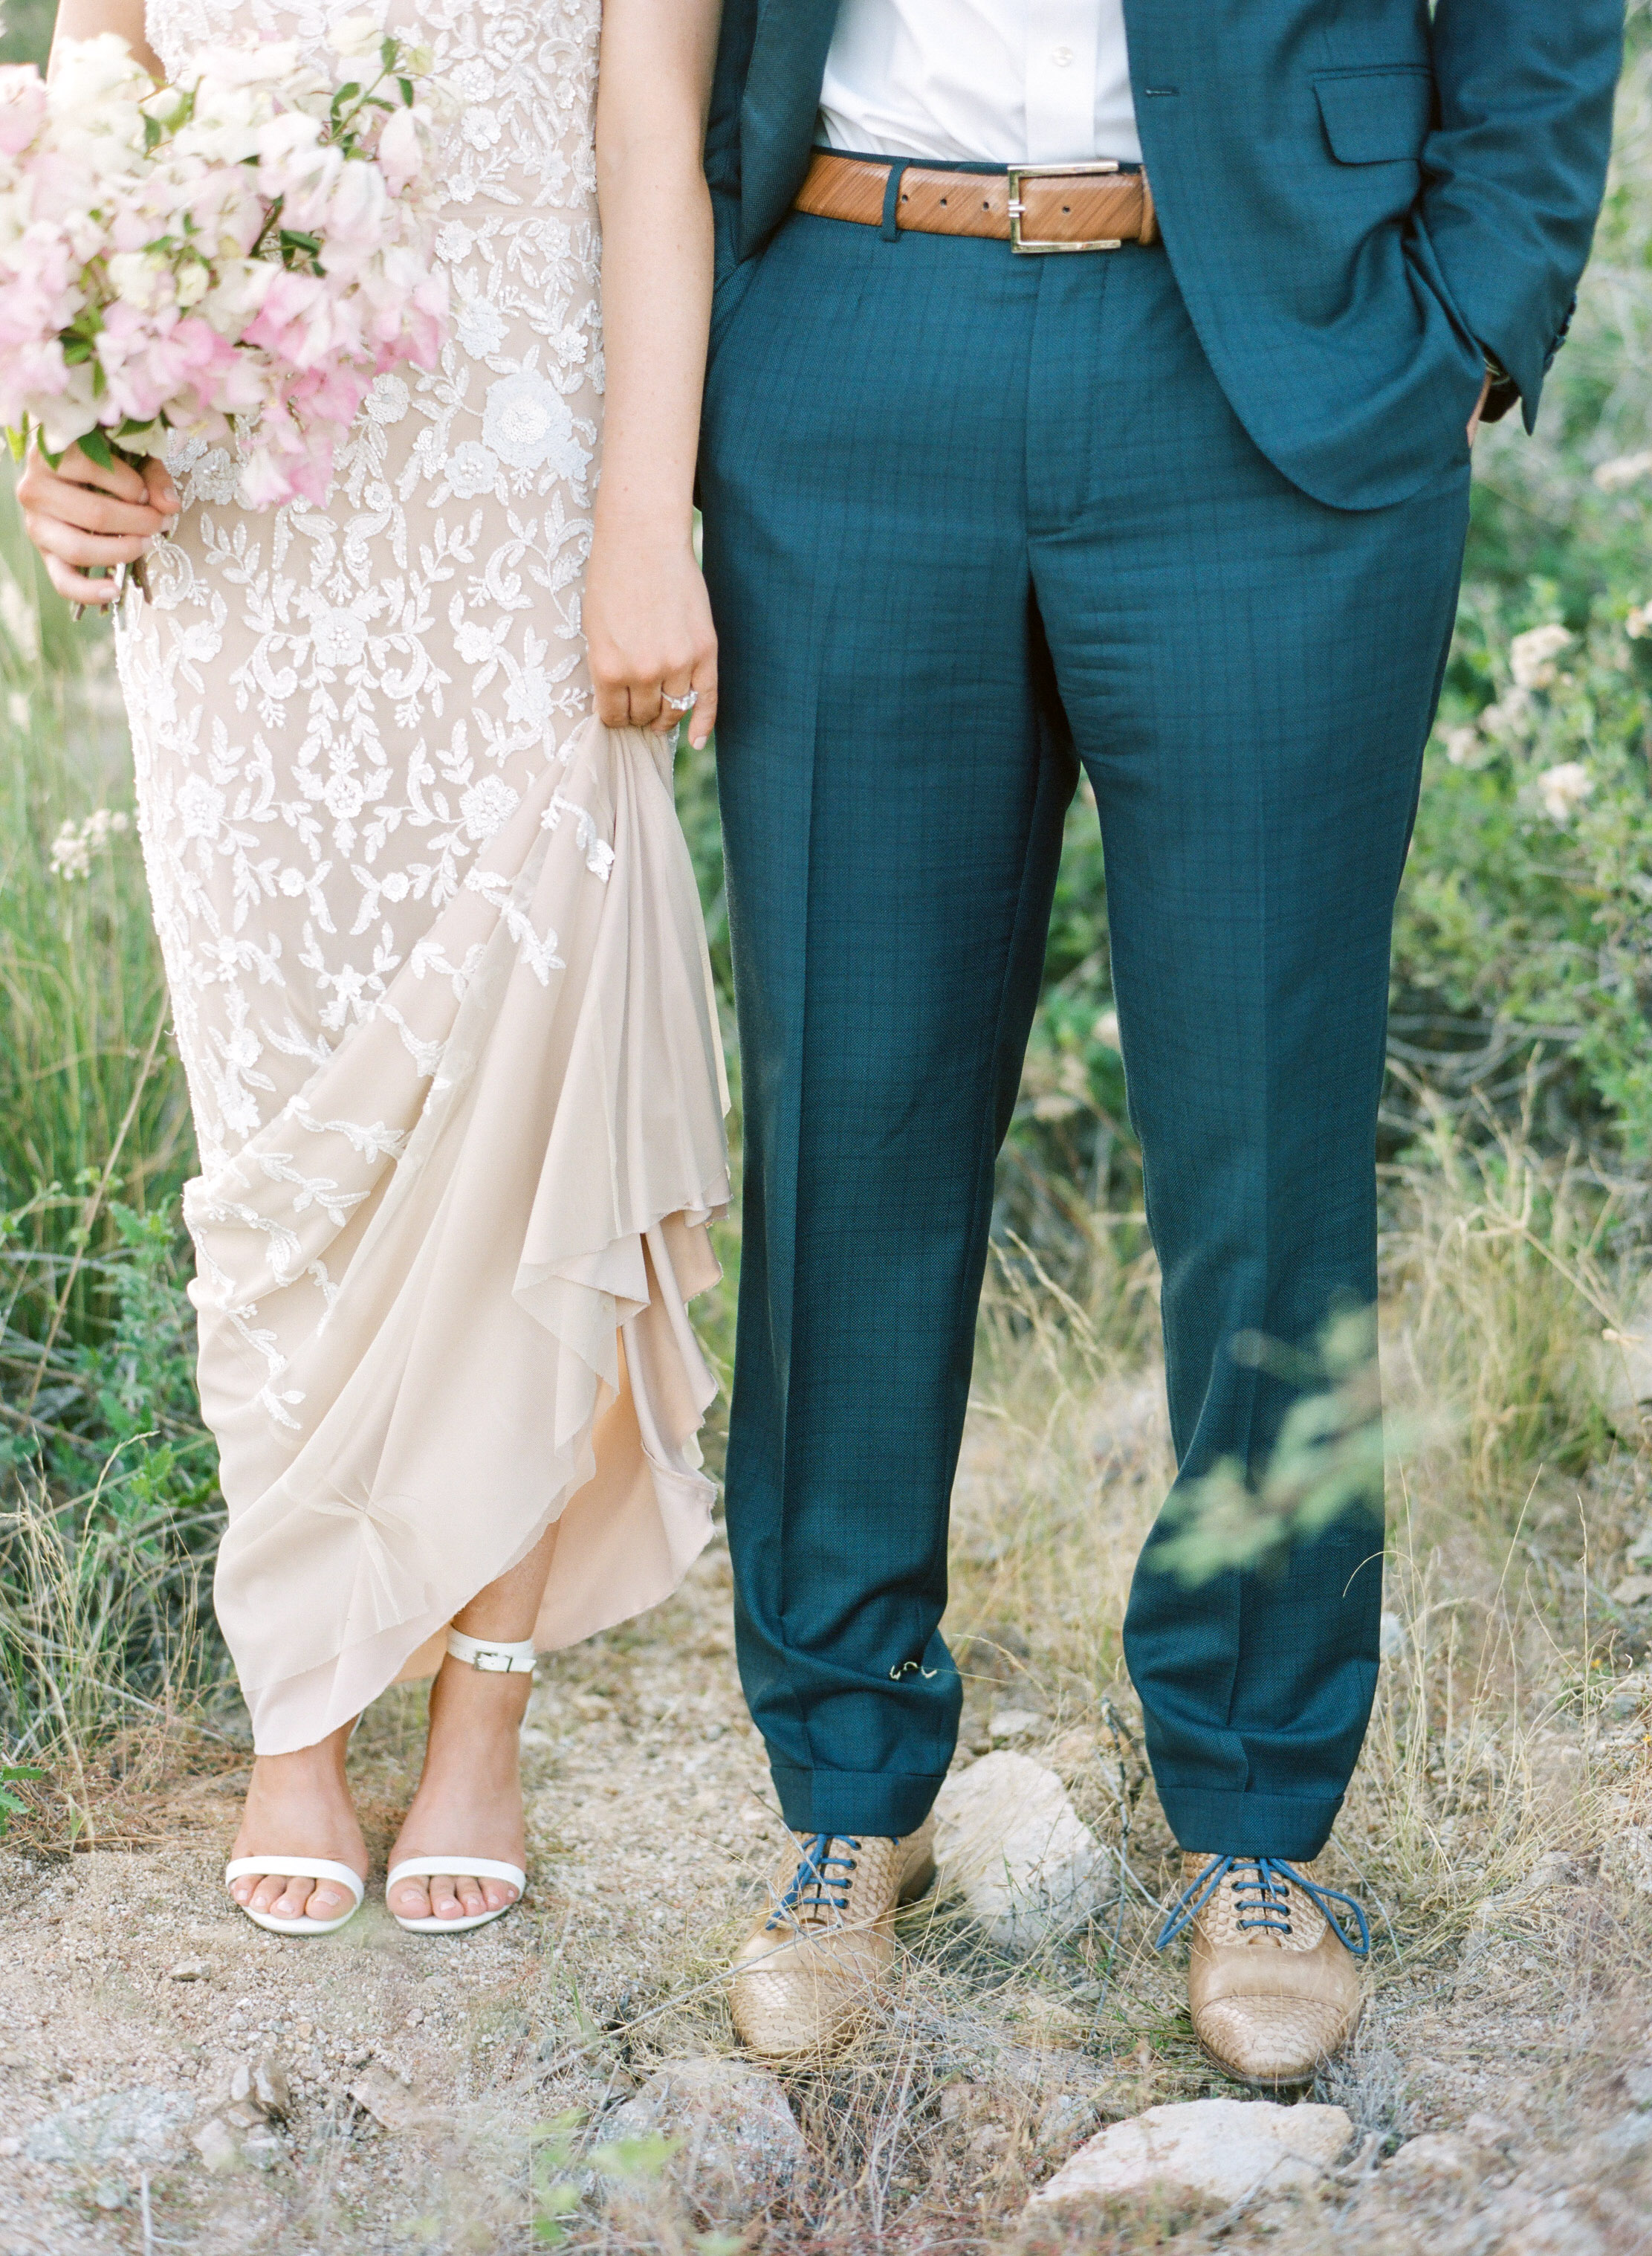 Dana-Fernandez-Photography-Destination-Wedding-Photographer-Cabo-San-Lucas-Film-Houston-Texas-Cabo-3.jpg